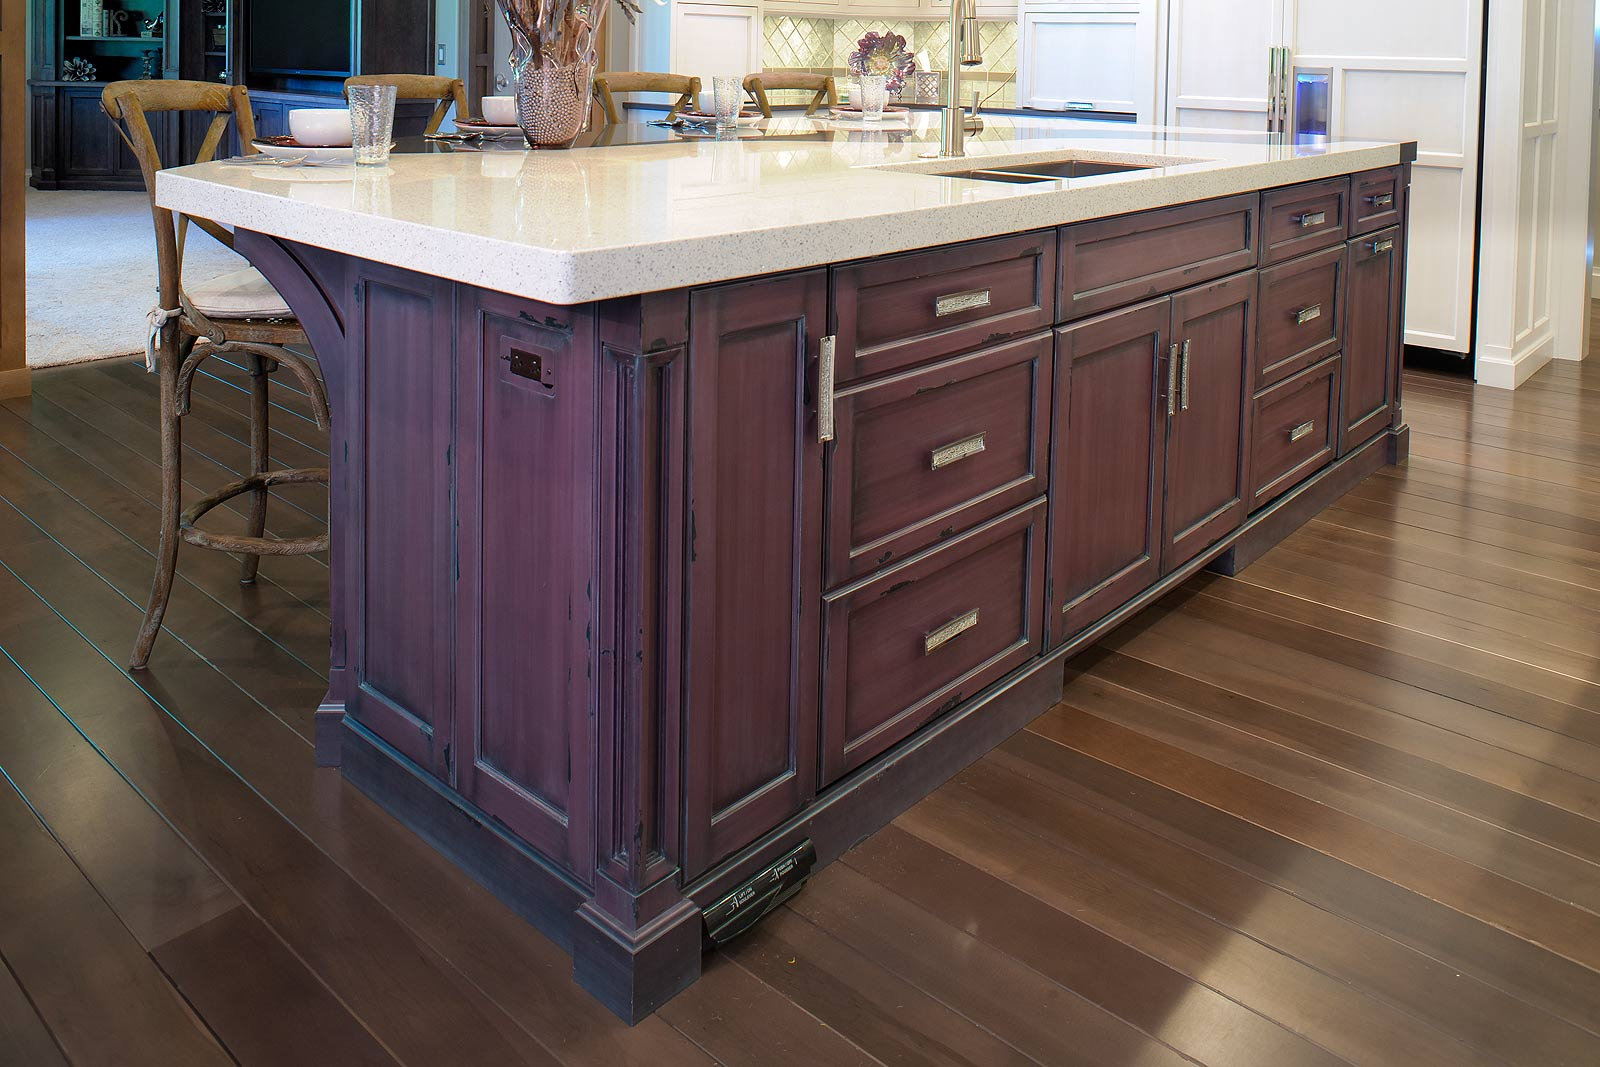 Mullet Cabinet Unique Kitchen With Plum Island